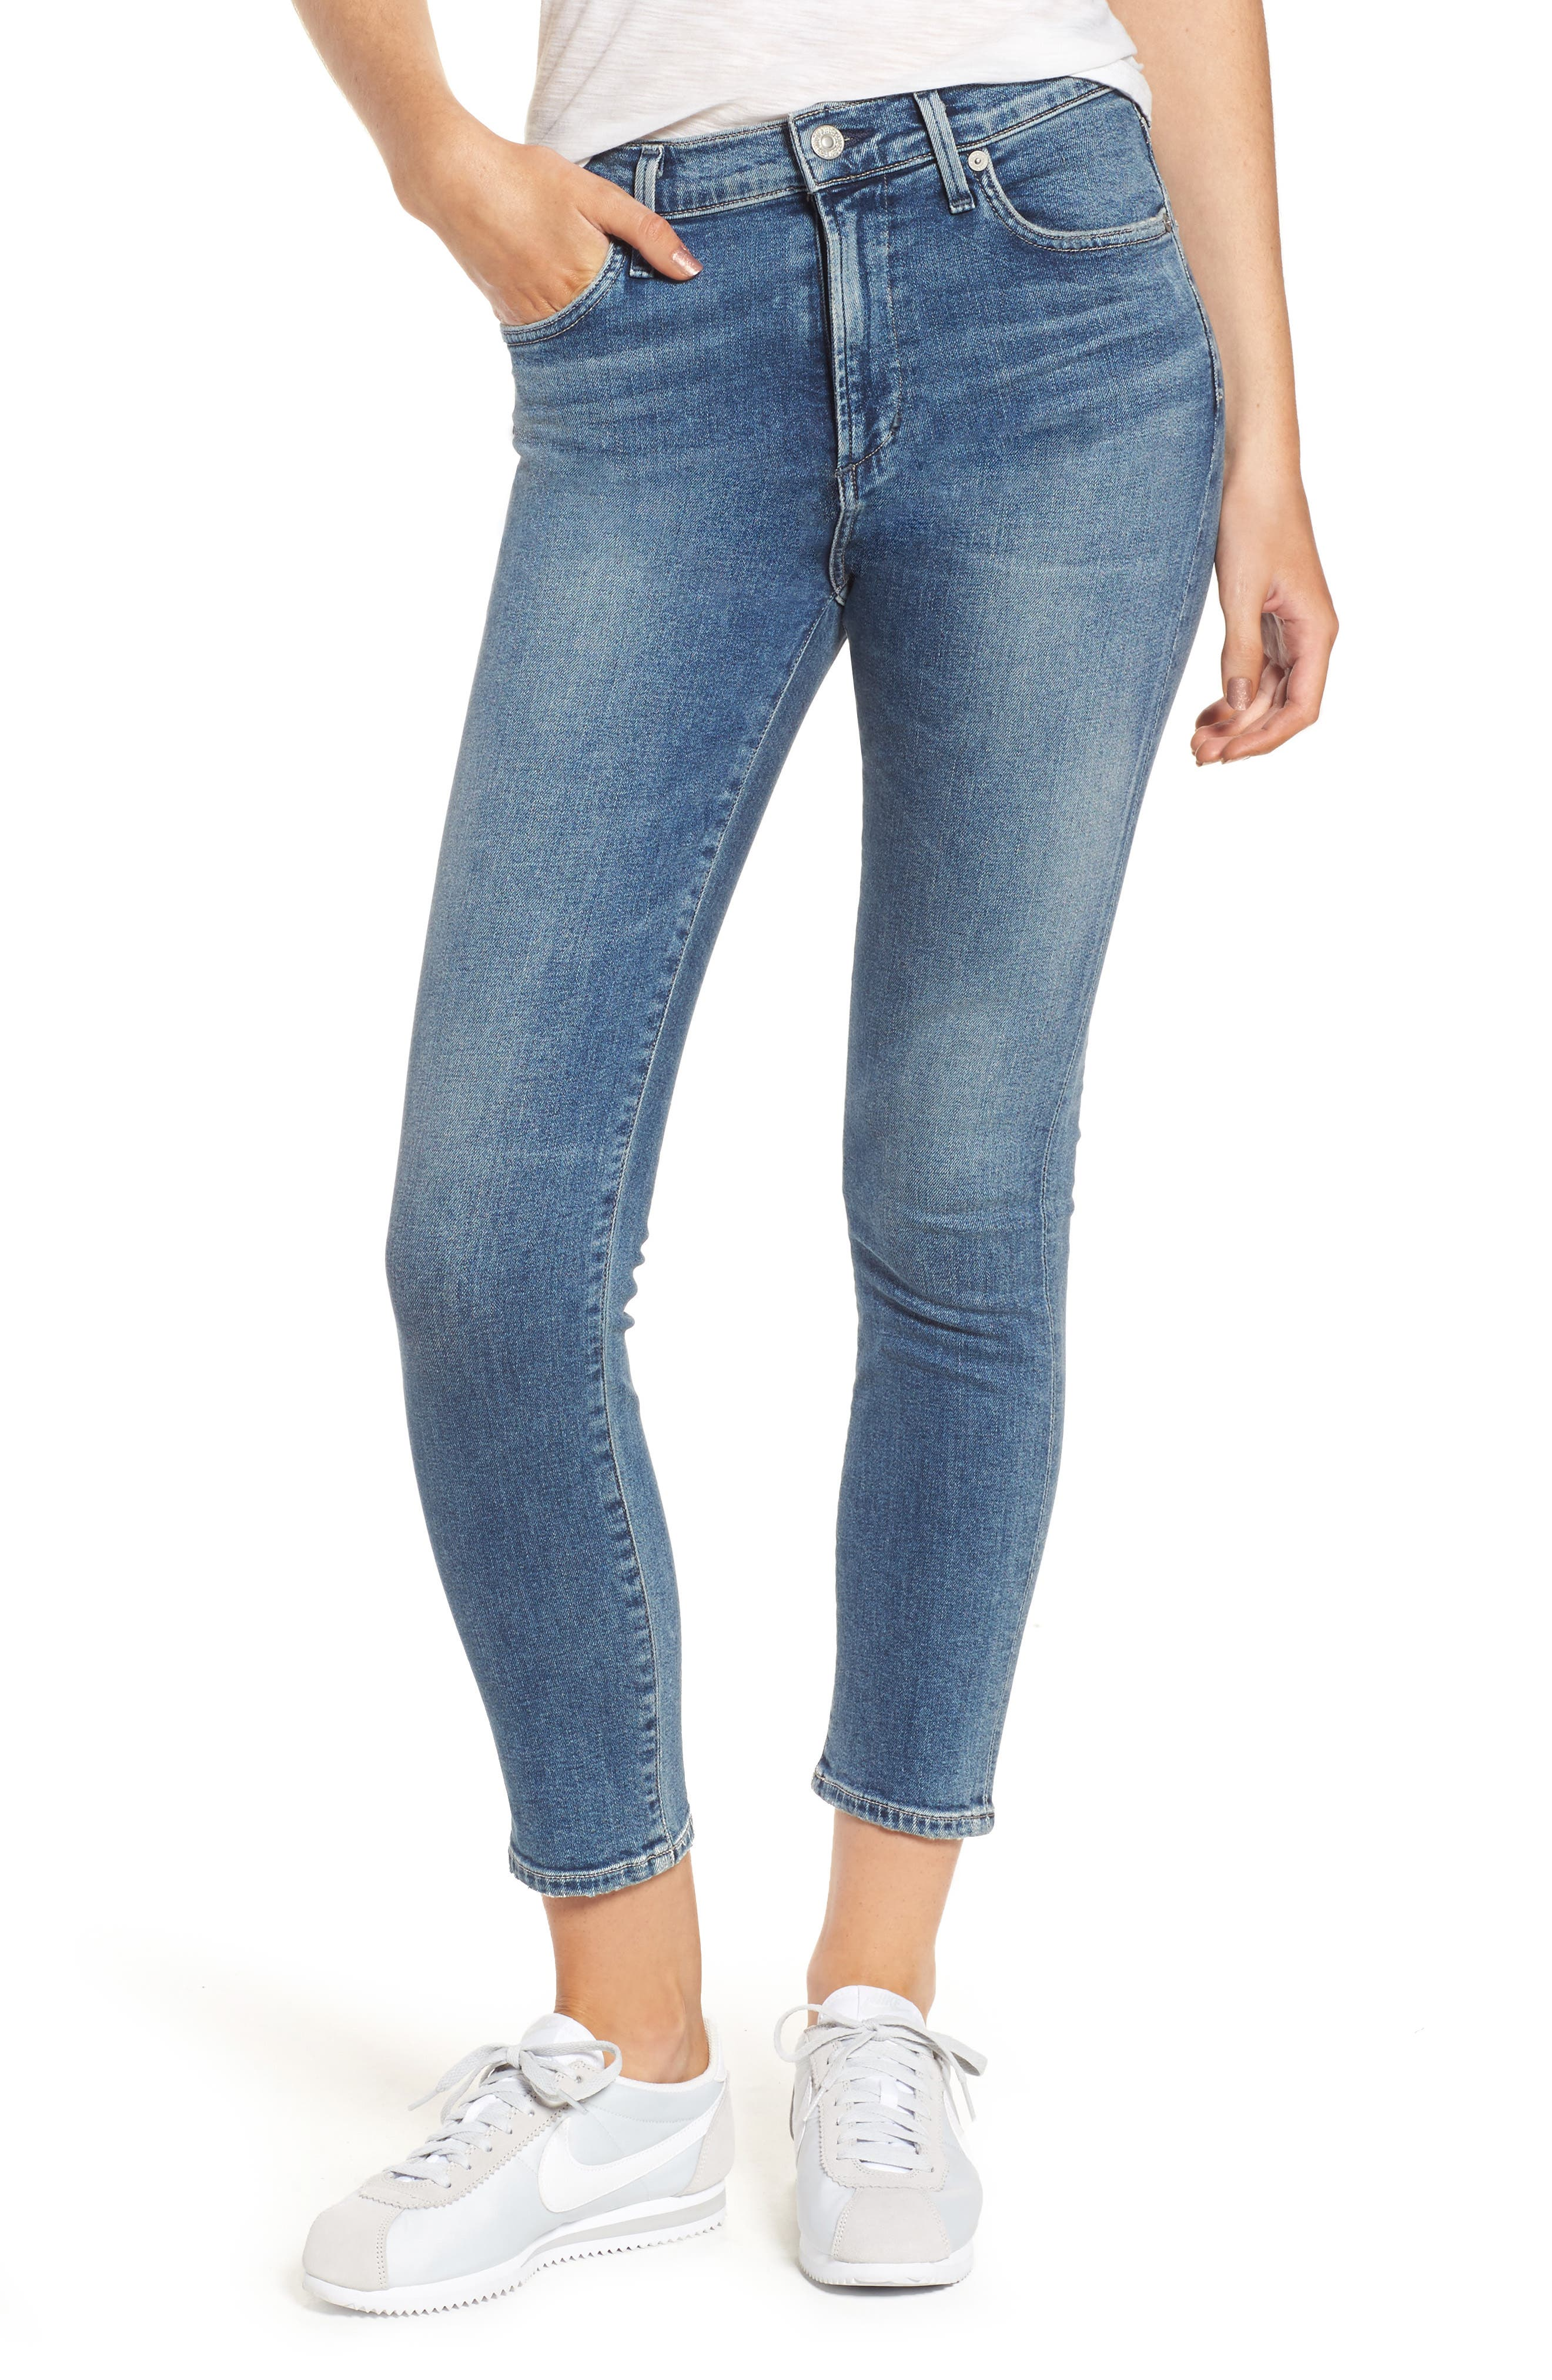 Alternate Image 1 Selected - Citizens of Humanity Rocket Crop Skinny Jeans (Orbit)